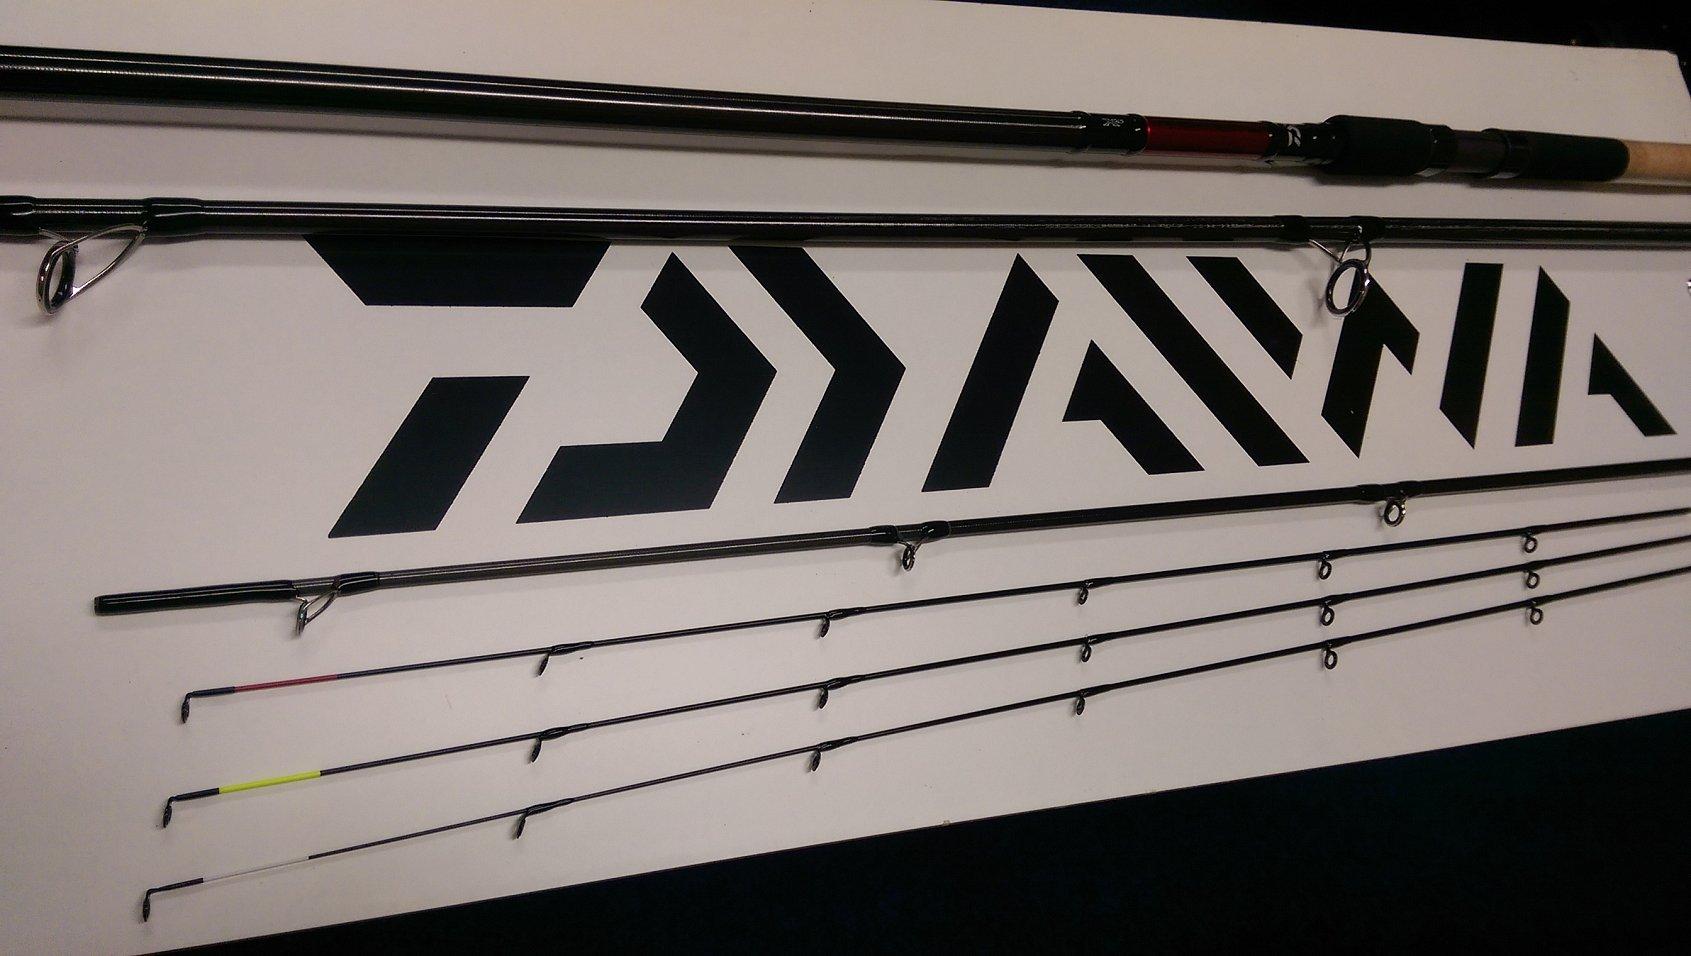 ad51ff4cf70 Daiwa Tournament SLR Feeder Rods - Buy Online